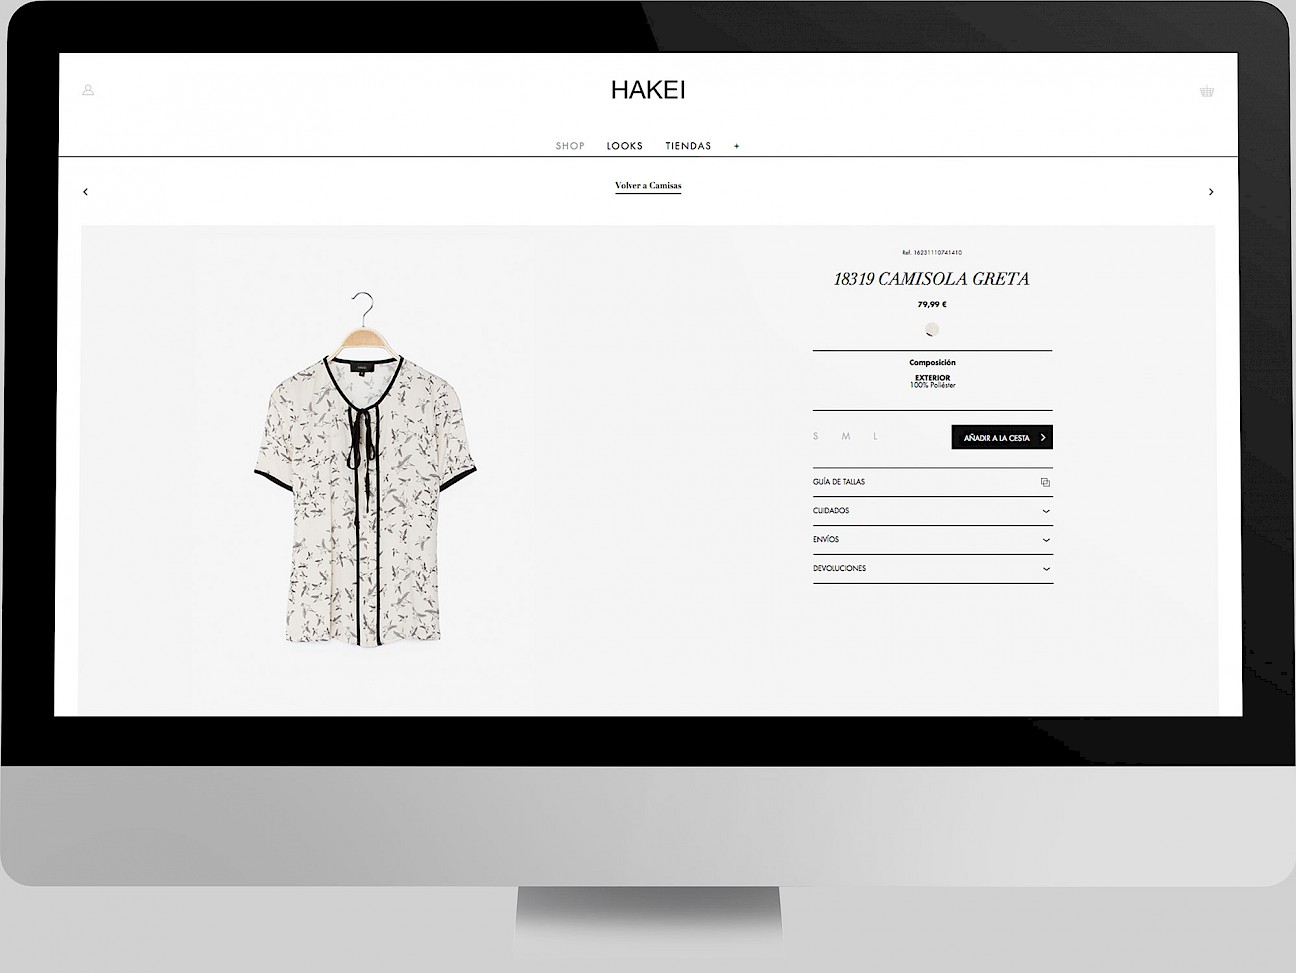 branding website move design digital 04 fashion hakei web